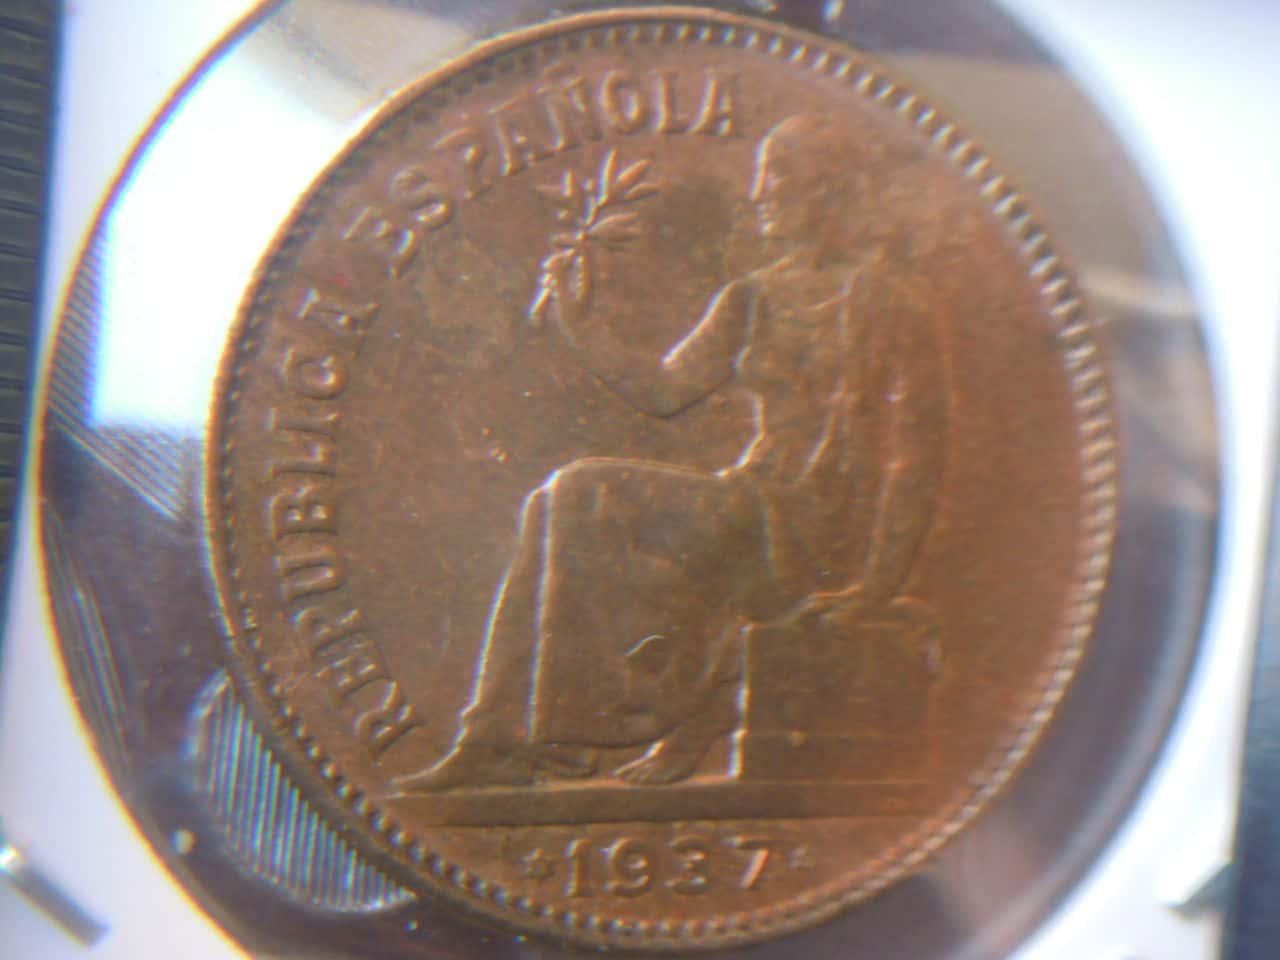 50 Centimos 1937 *34  II Republica - con cual me quedo? 50_centimos_1937_003